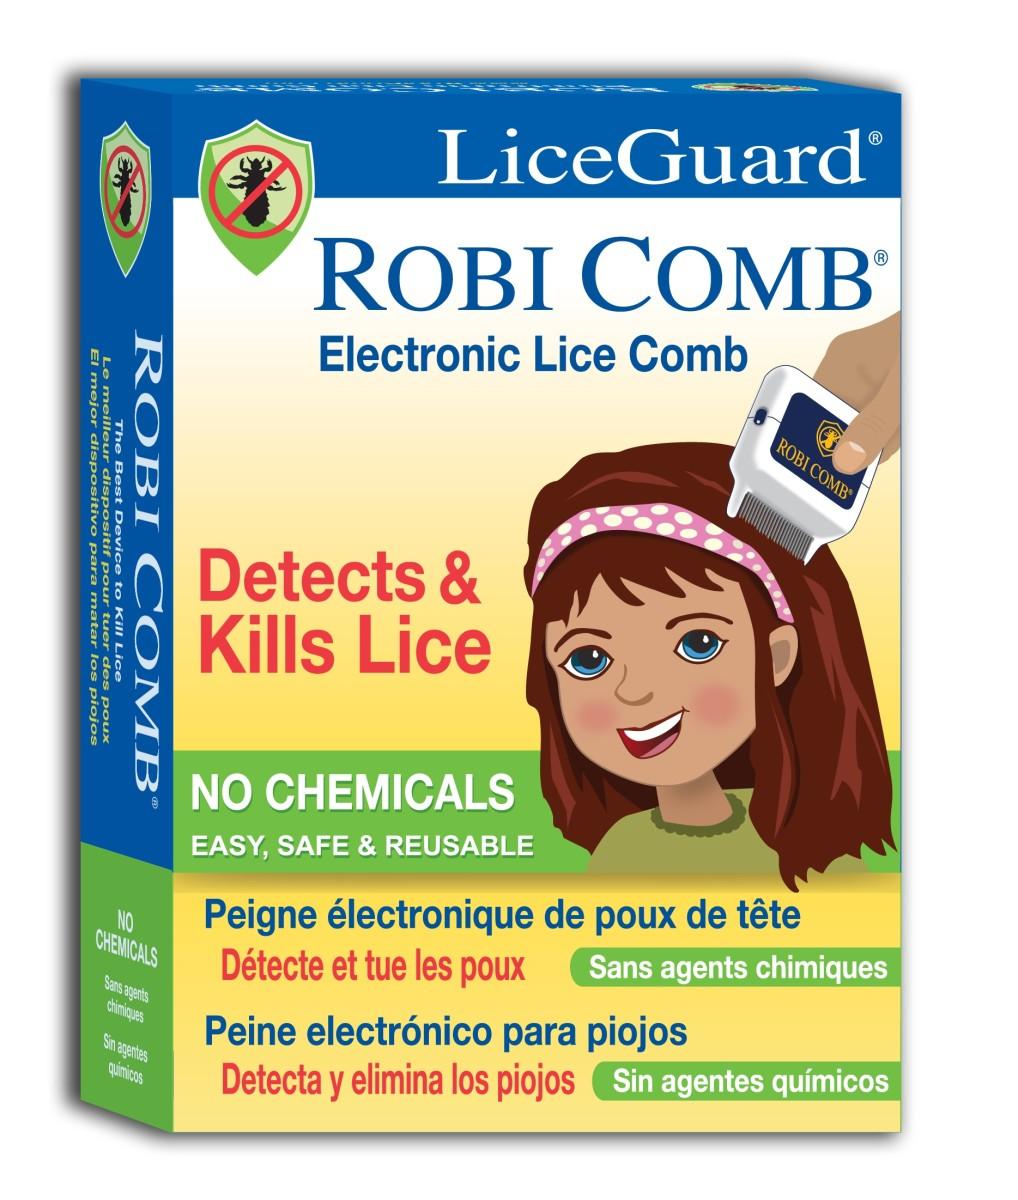 lice LG Robi Comb